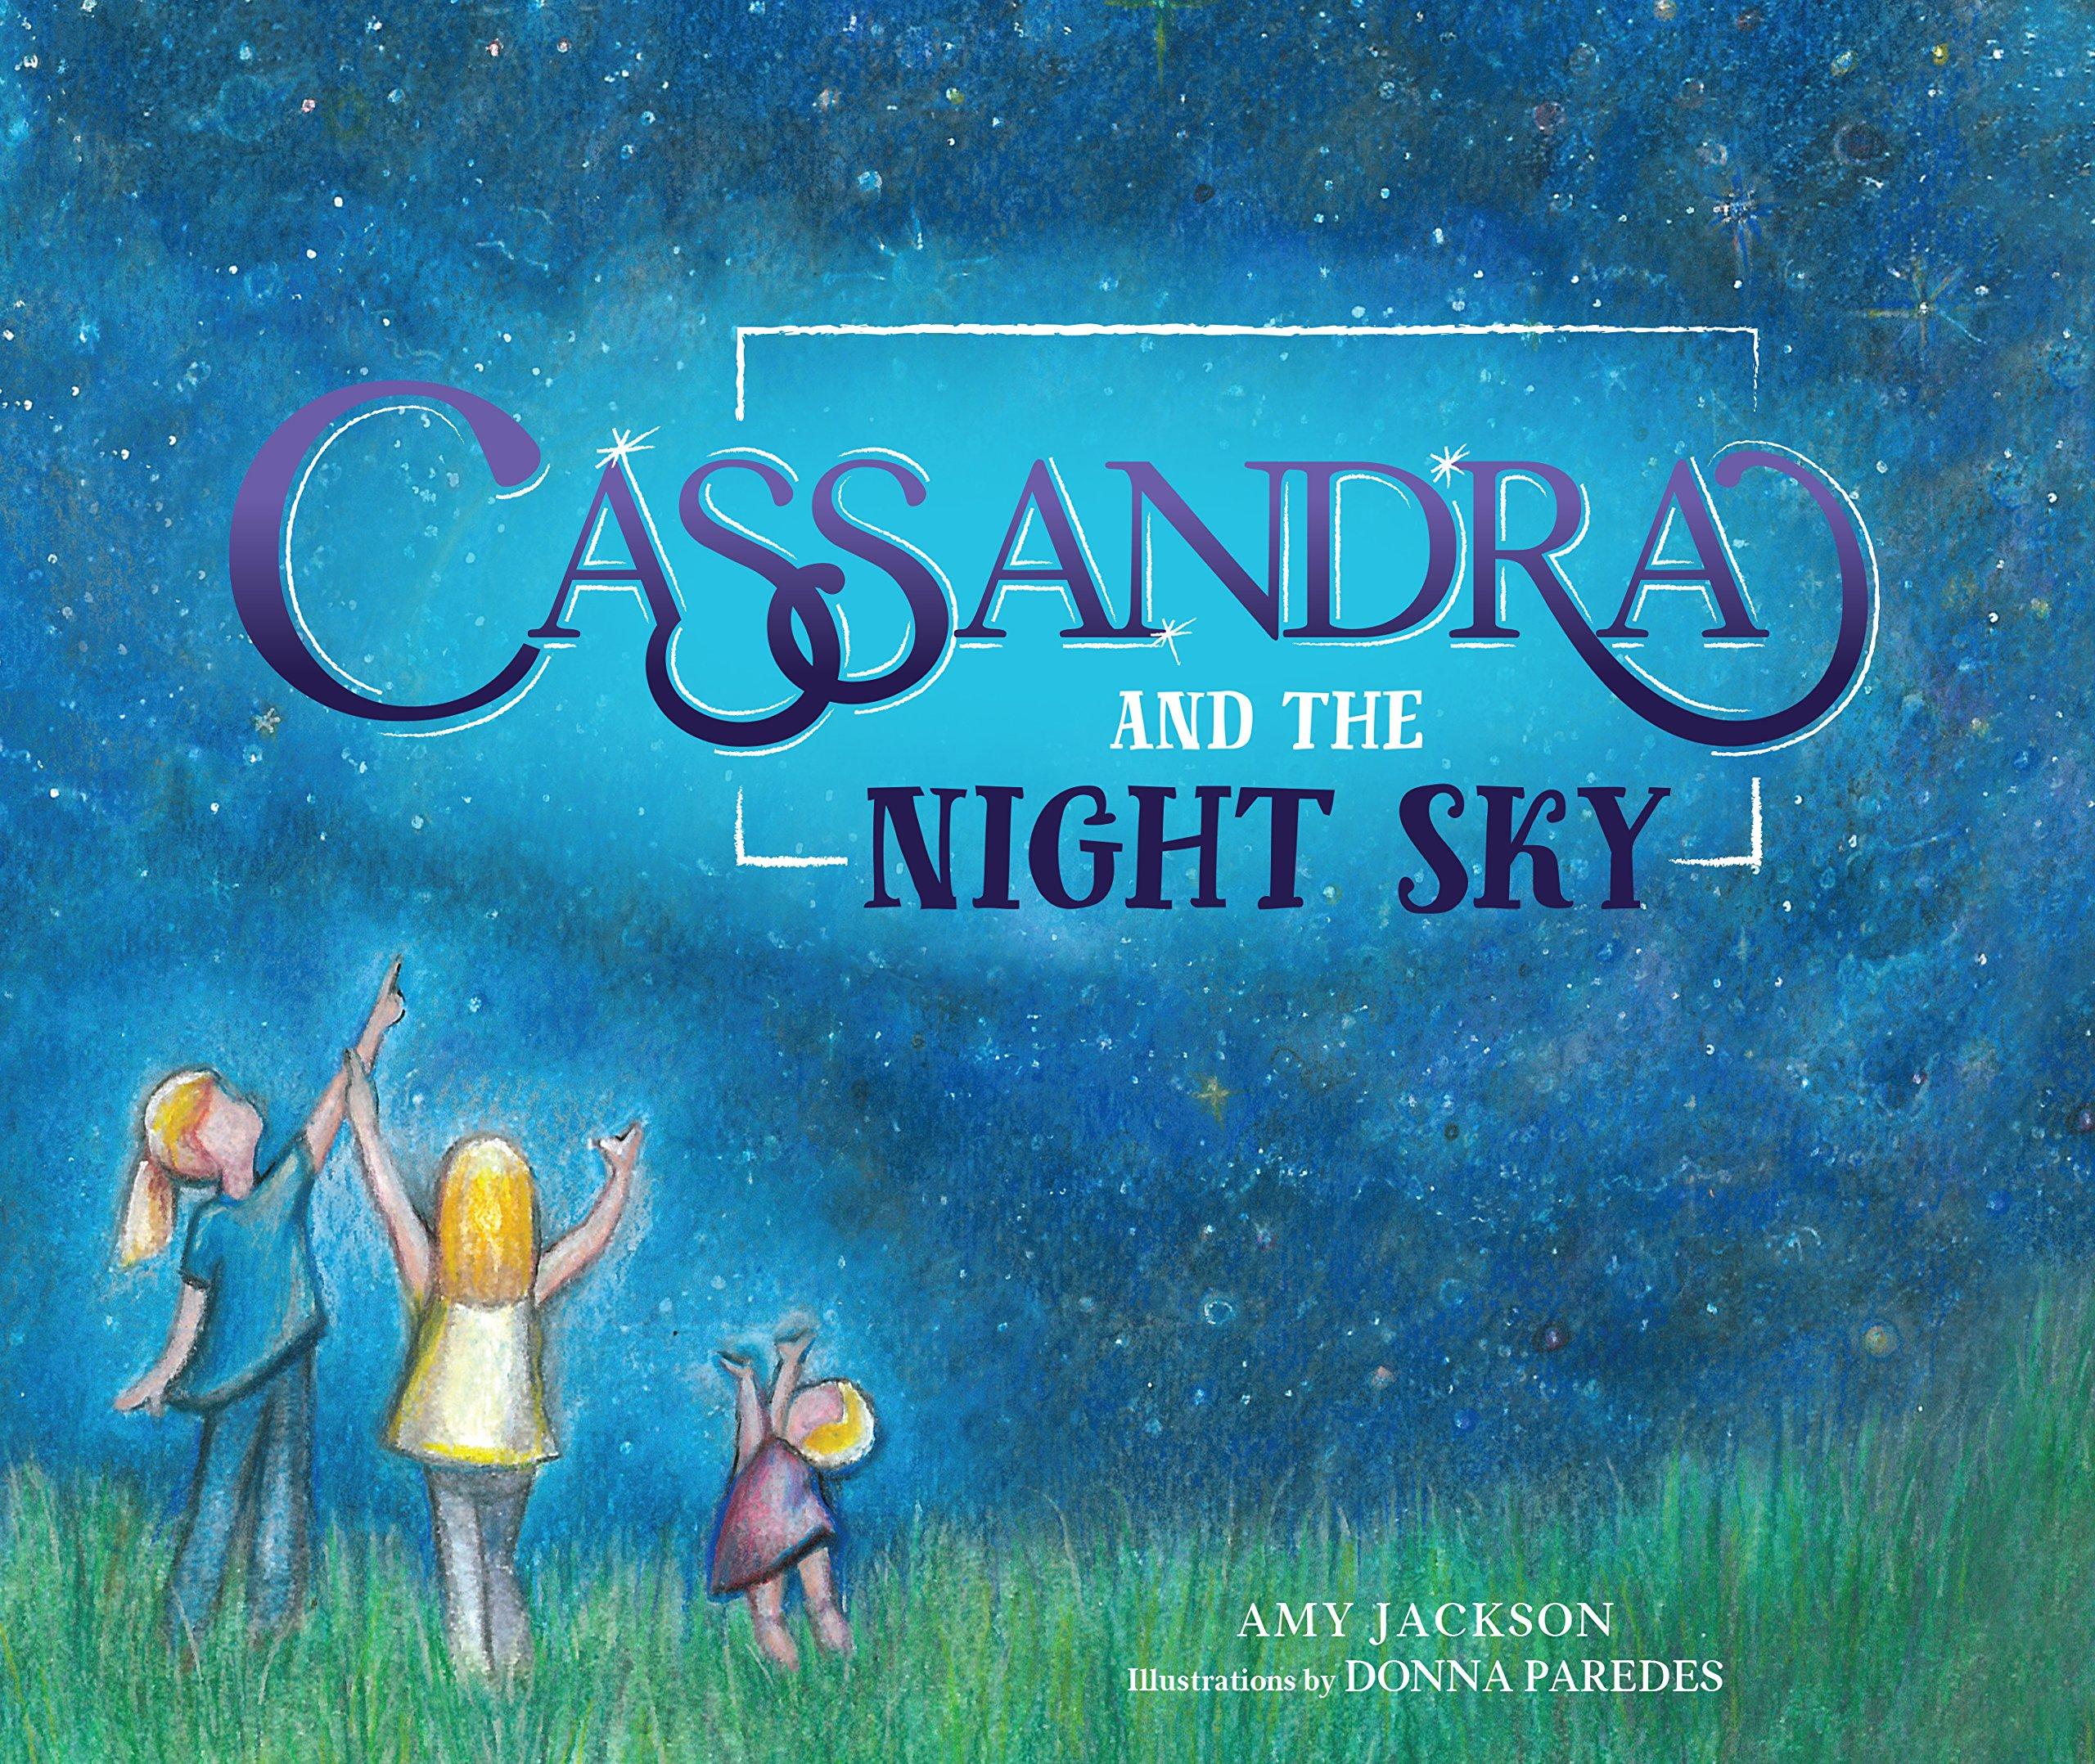 Cassandra and The Night Sky